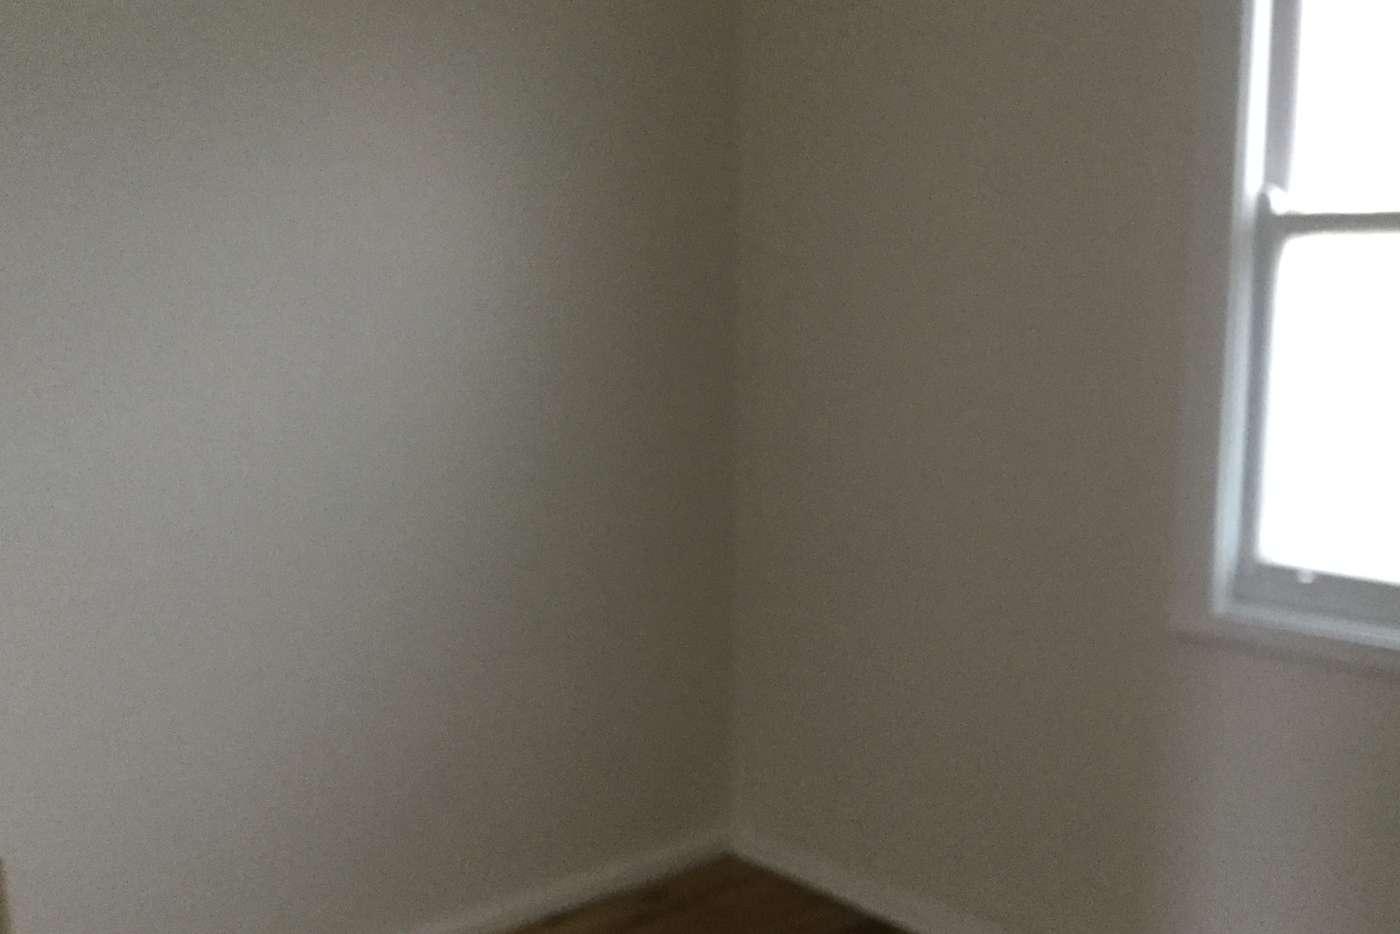 Seventh view of Homely house listing, 16 Victoria Street, Sebastopol VIC 3356